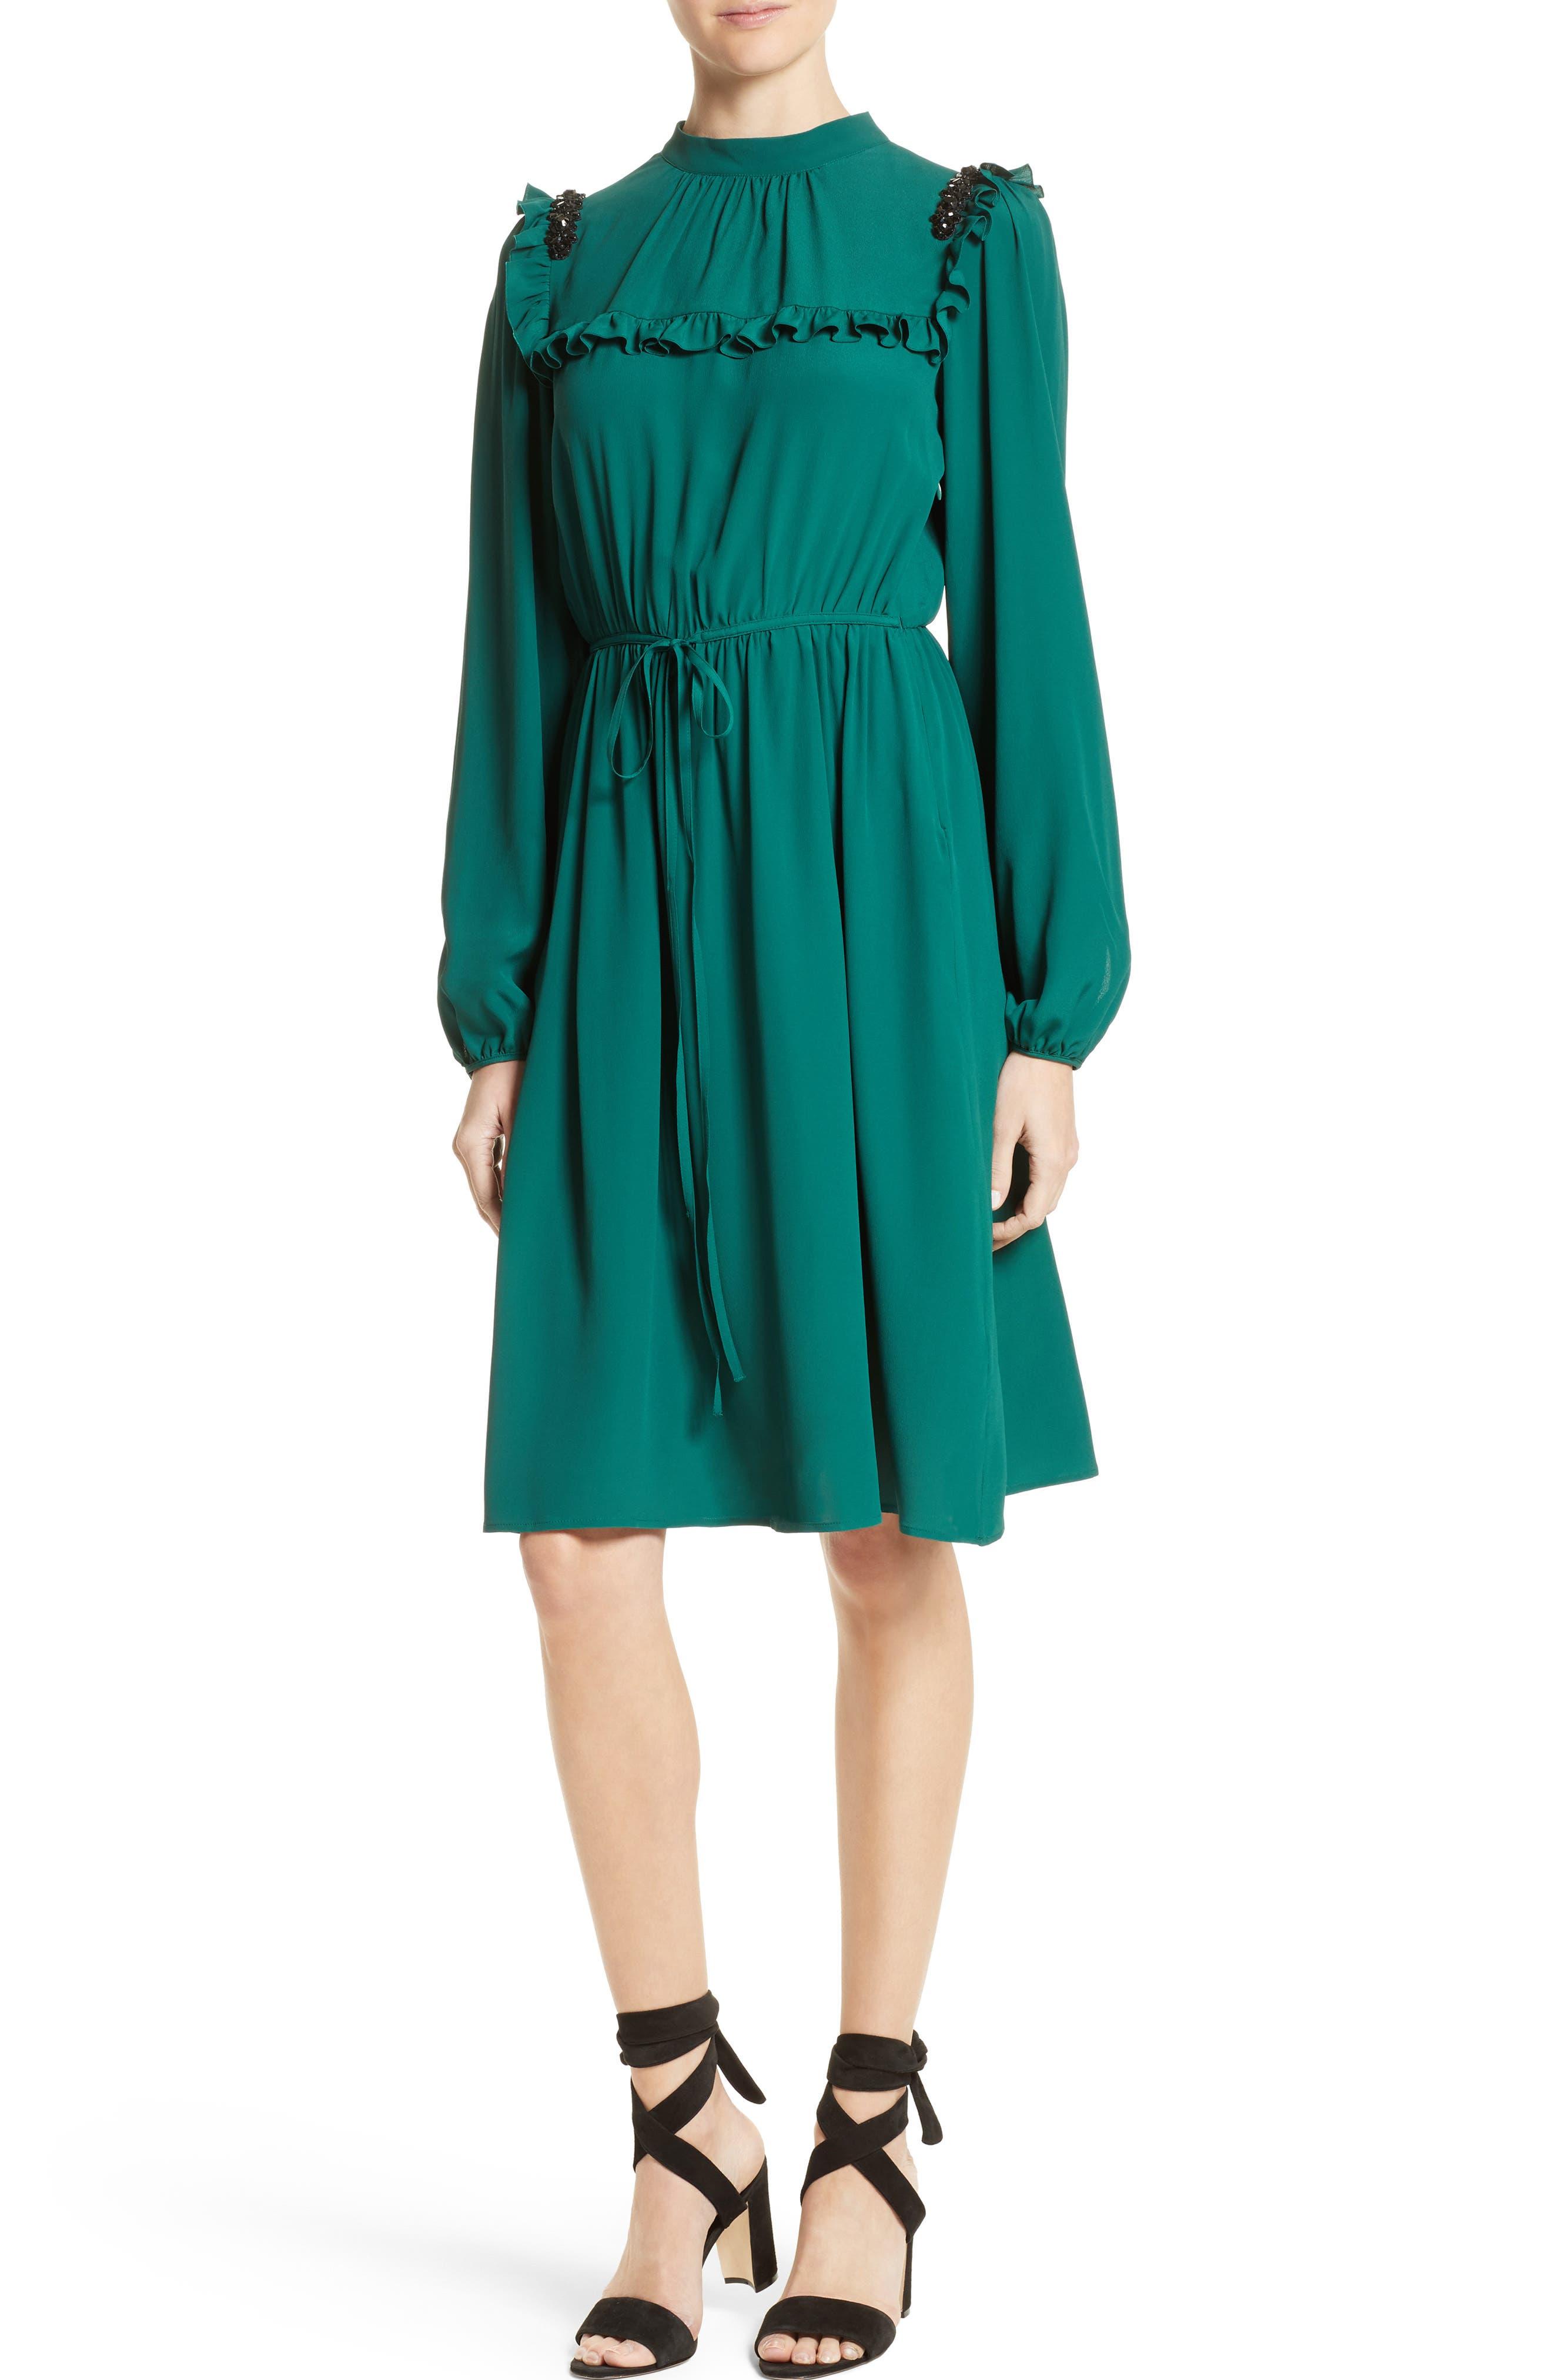 N°21 Crystal Embellished Ruffle Dress